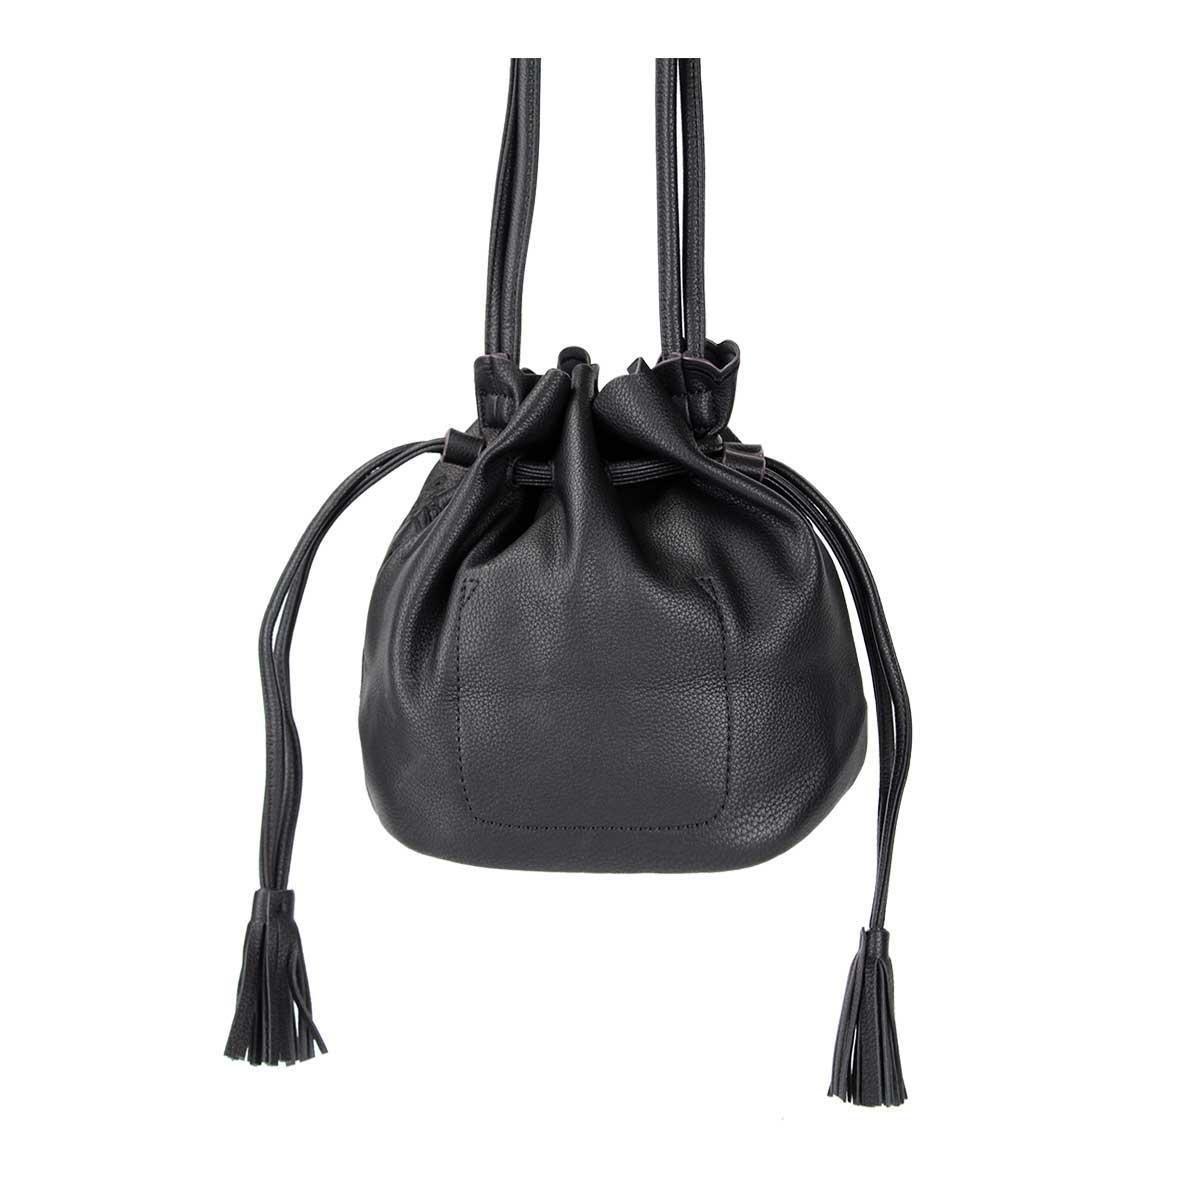 Mini Bolsa Saco Bucket Alça Transversal Feminina - Preto - Compre ... 50a8ea498a9